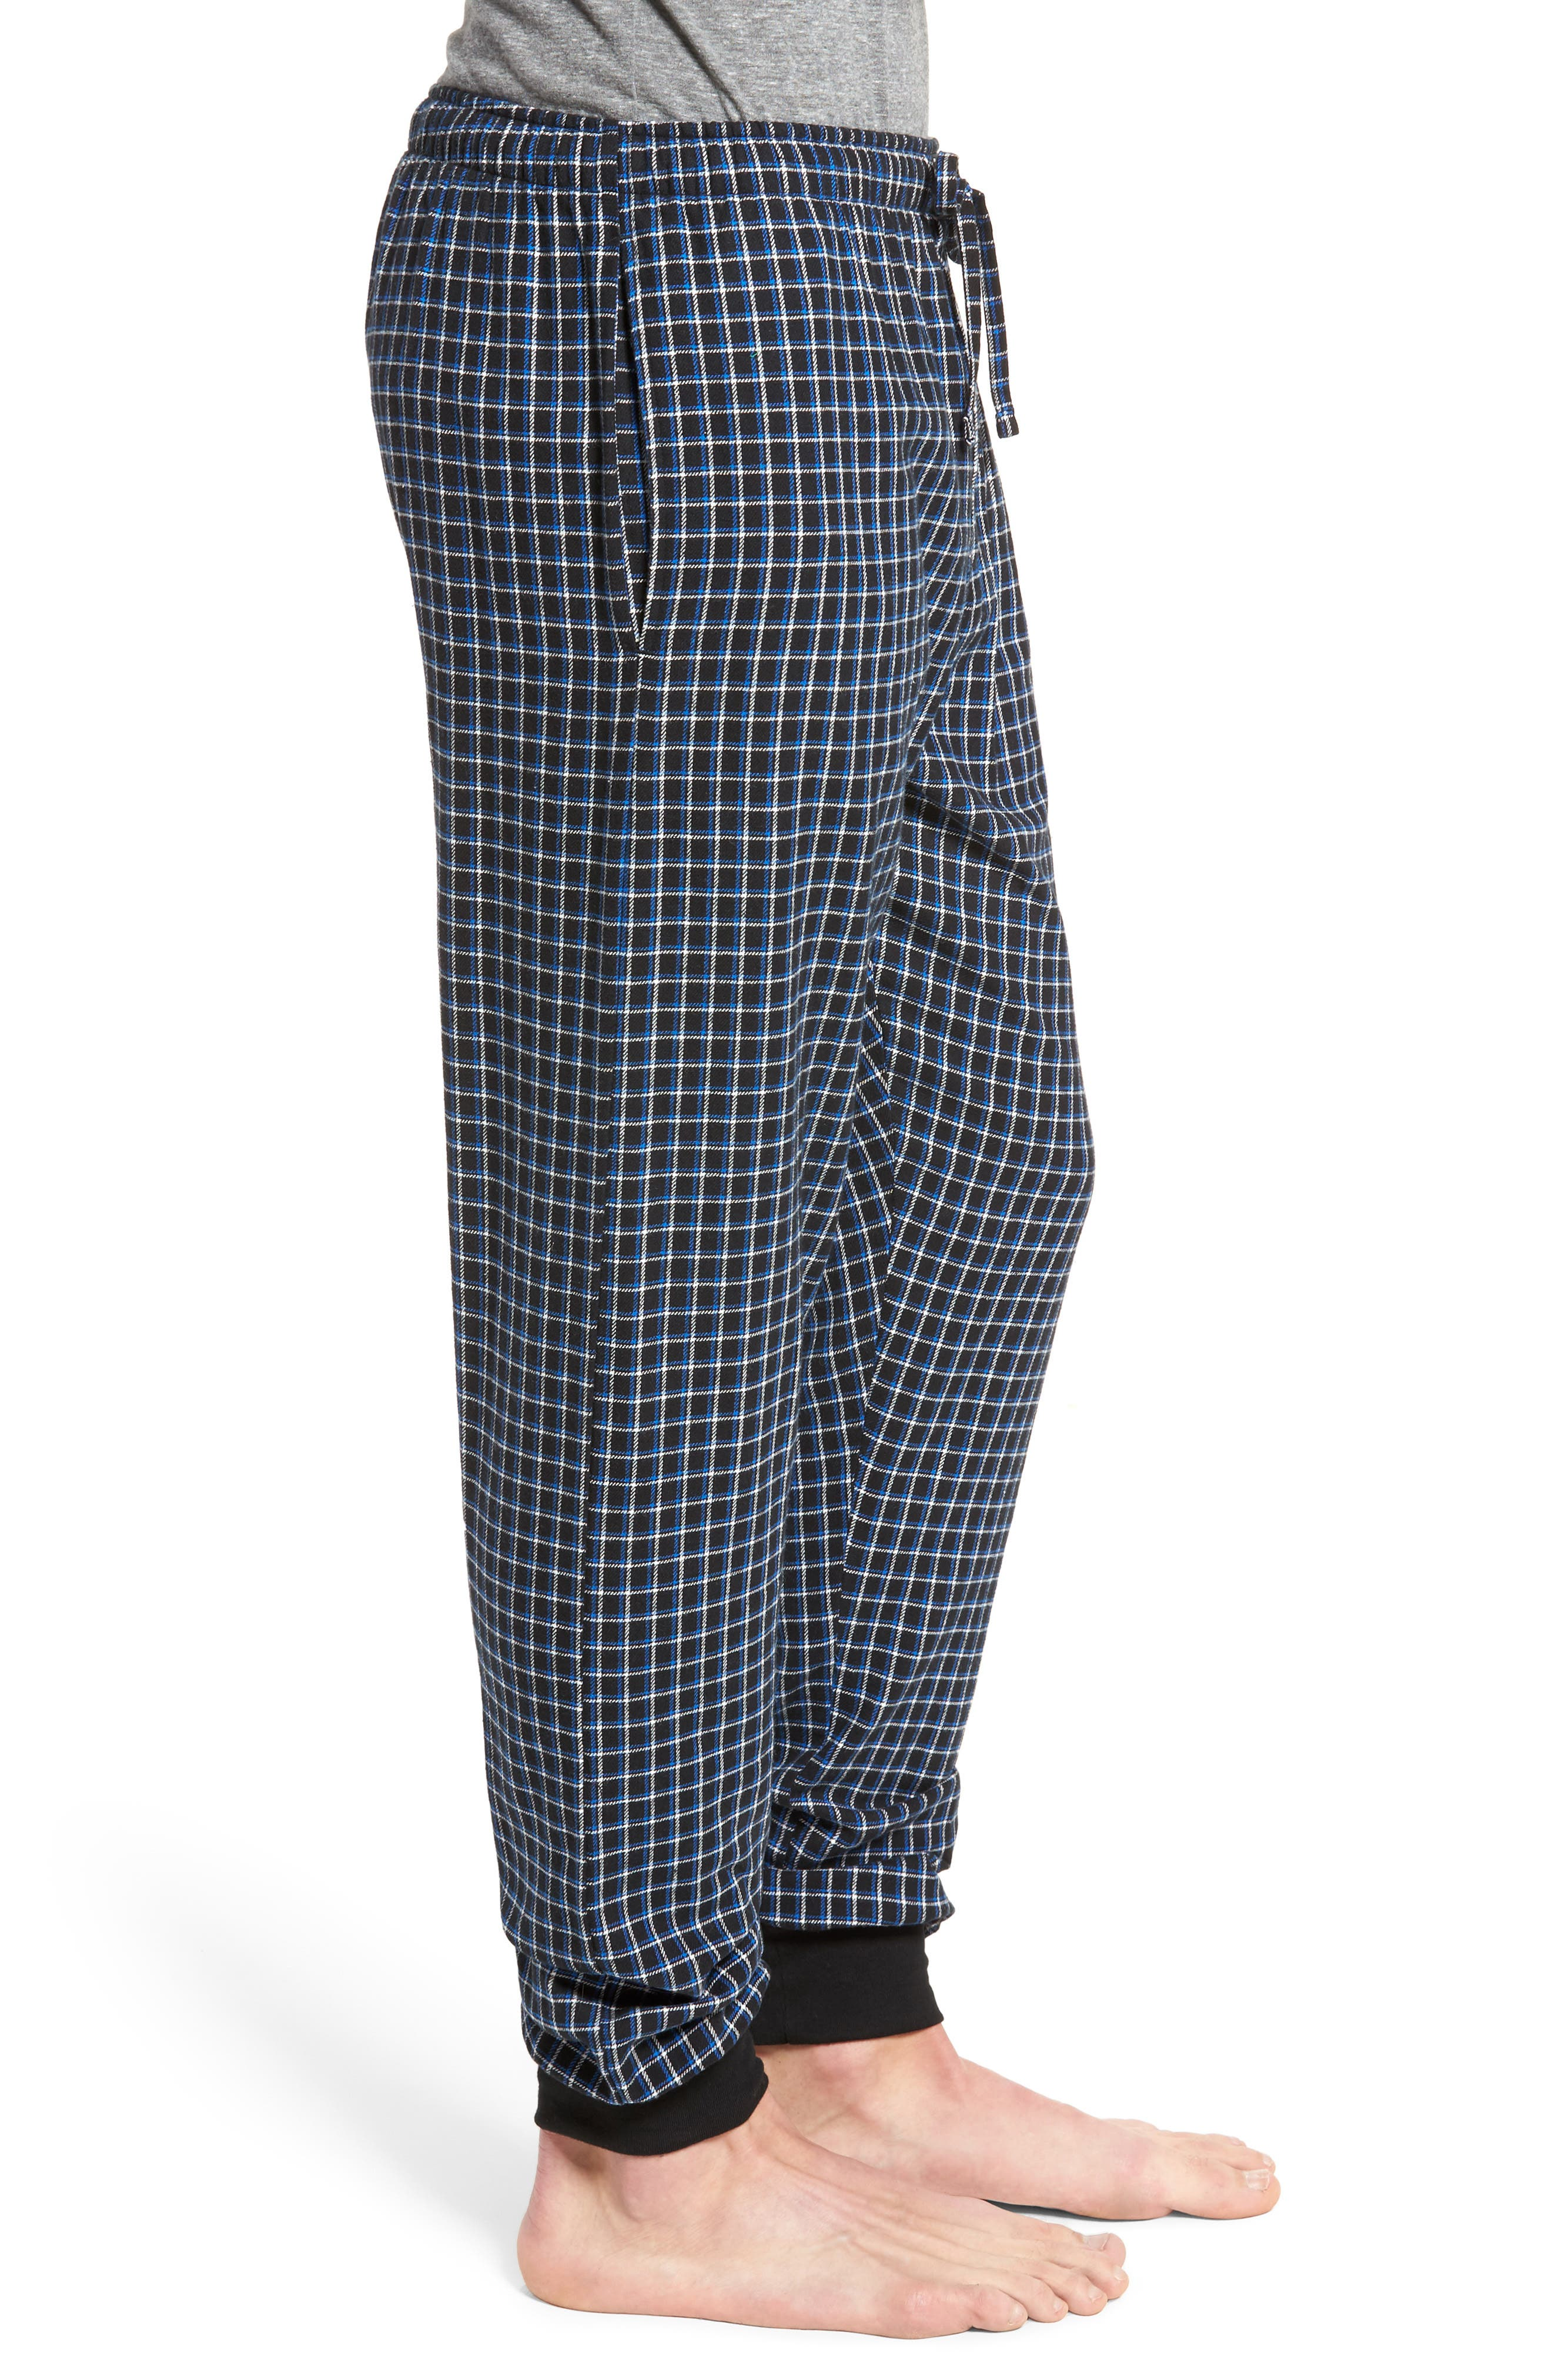 Flannel Pajama Jogger Pants,                             Alternate thumbnail 3, color,                             Logan Plaid/ Crescent Cream